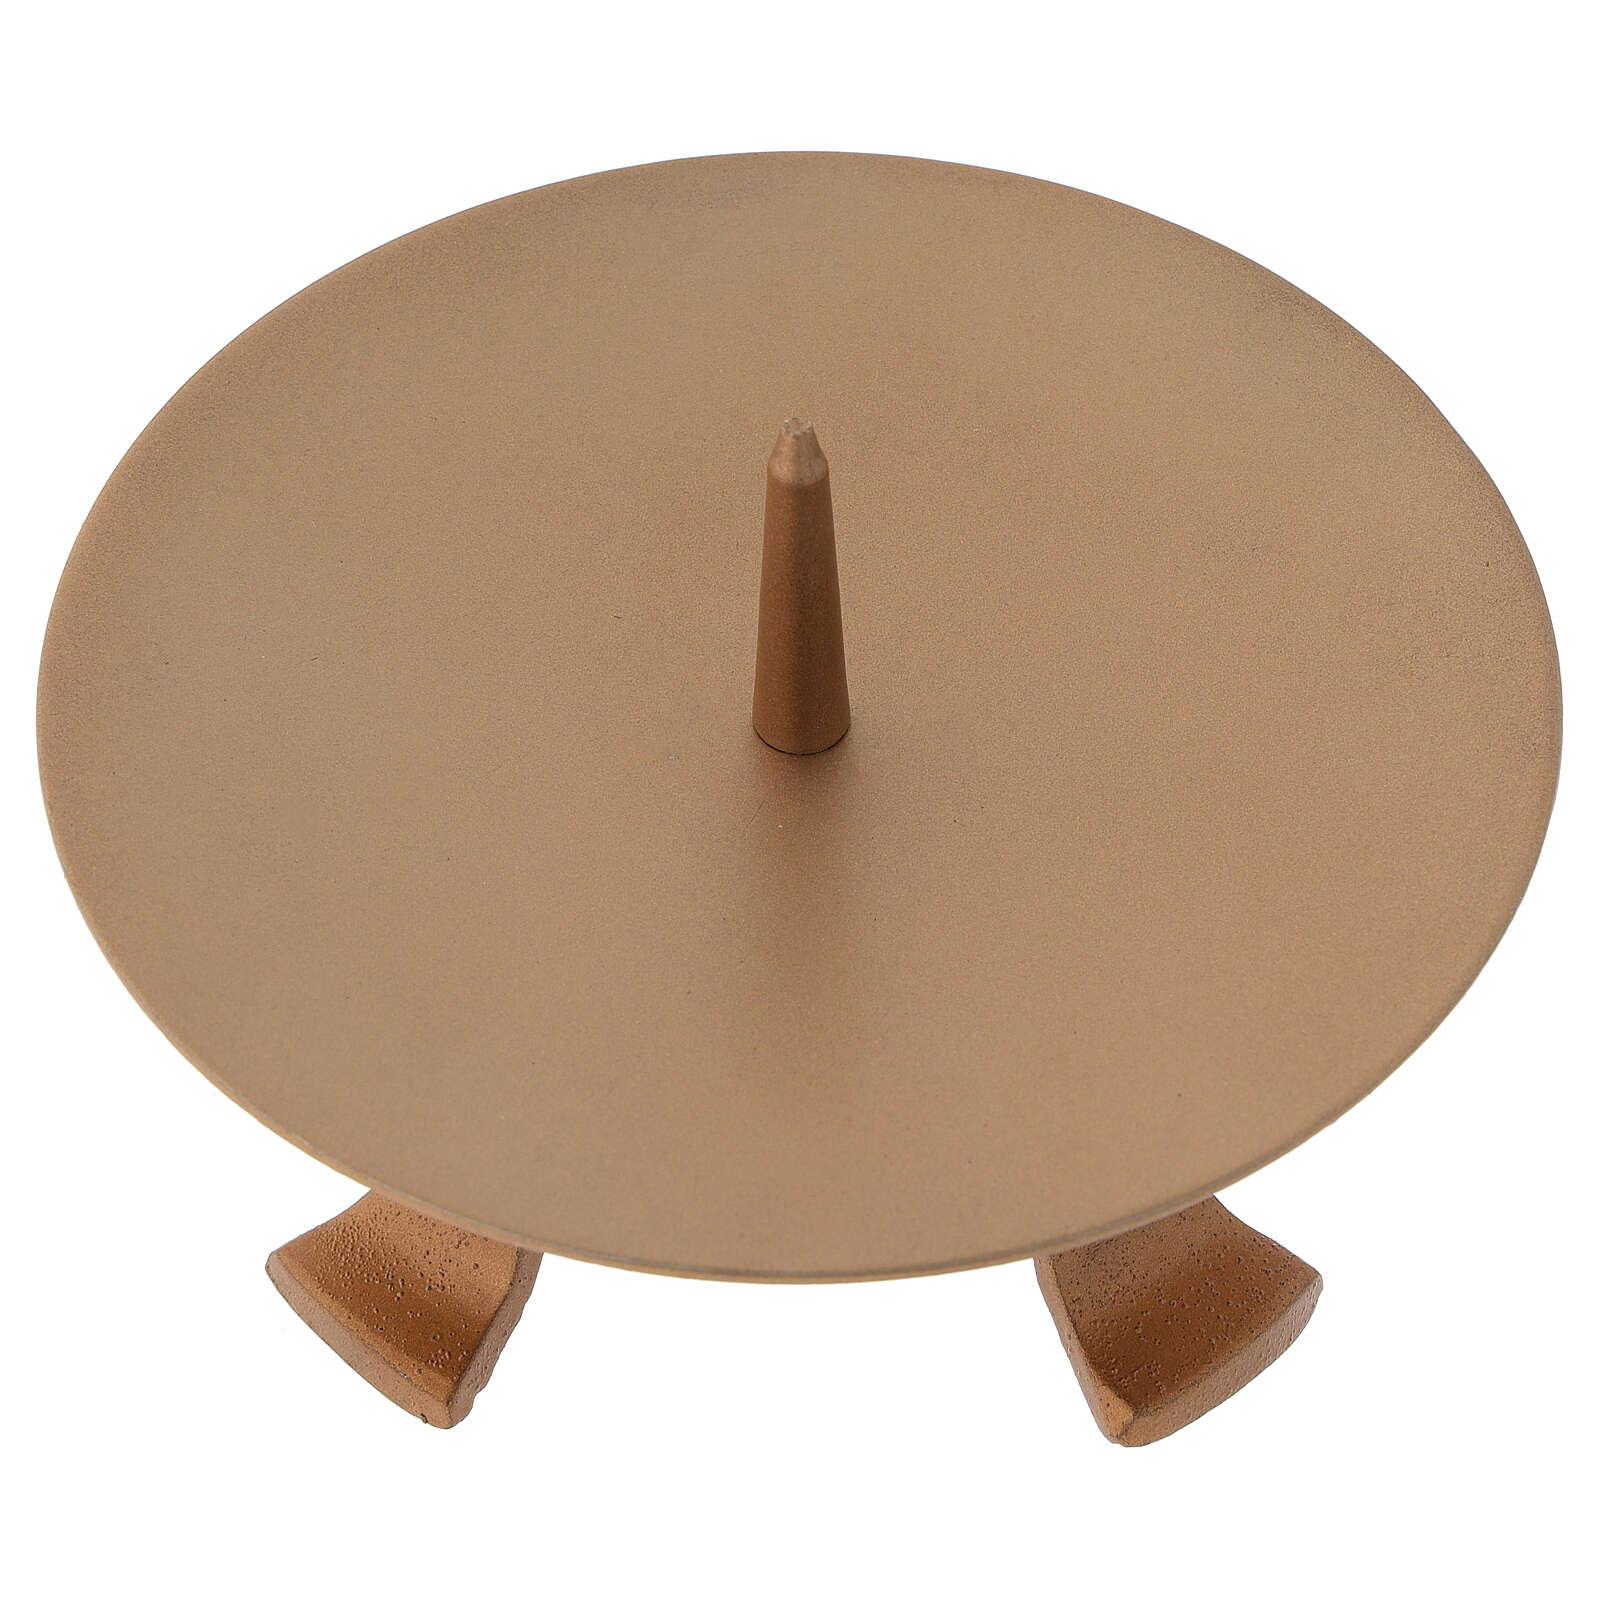 Portavela pies hierro dorado punta diámetro 13 cm 4